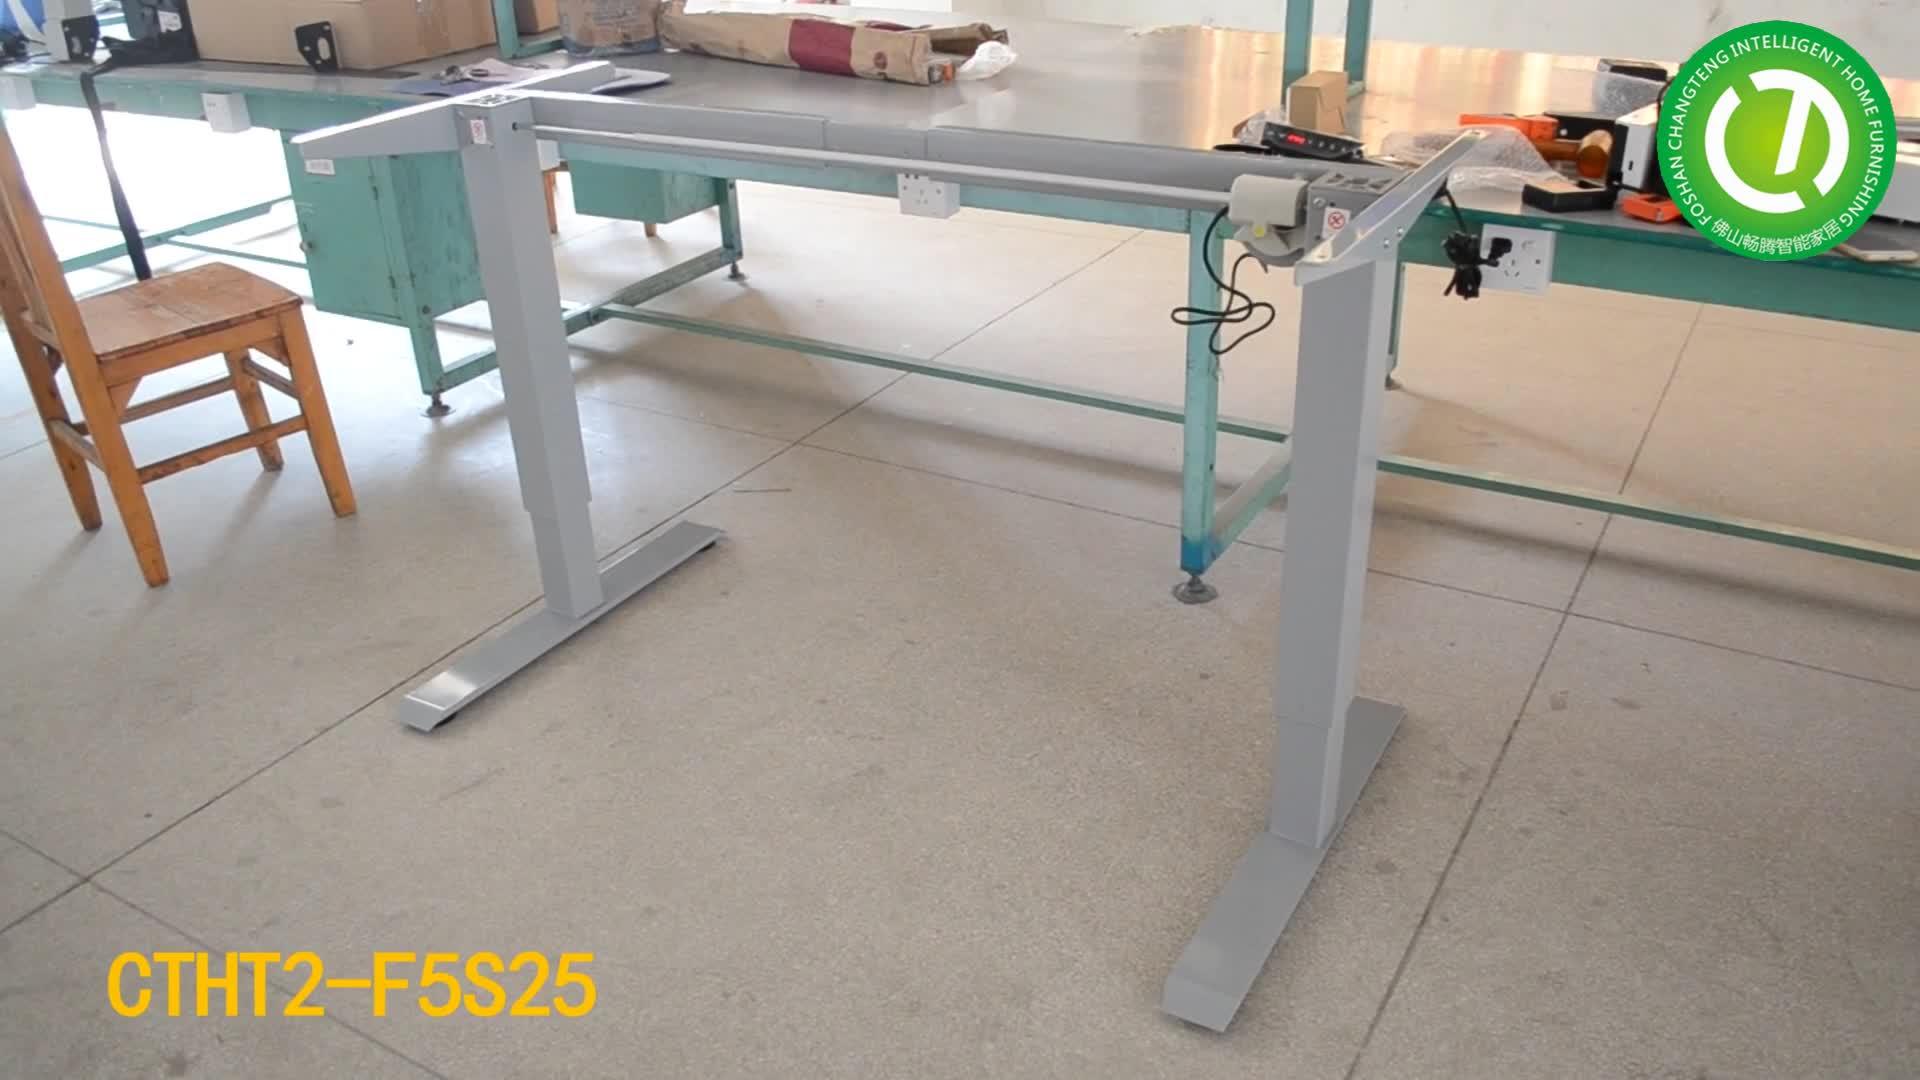 Elektrische hoogte verstelbare tafel intelligente hoogte